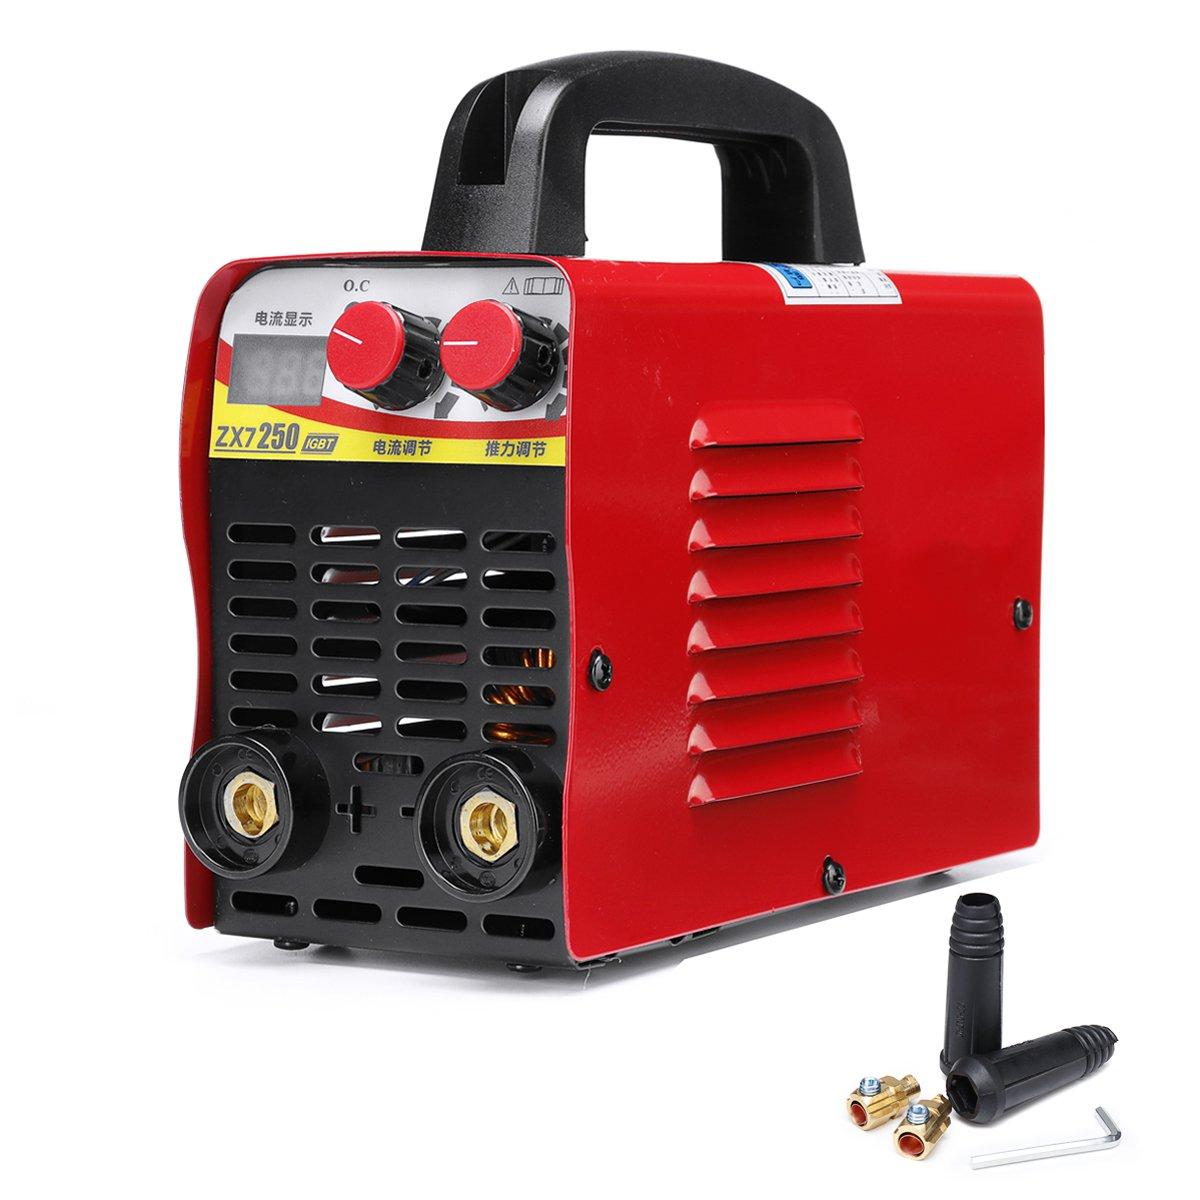 220V 6KW/9.5KW ZX7-250 10-250A Arc Force Electric Welding Machine Mini/Pro LCD Digital Display MMA IGBT Inverter Welders